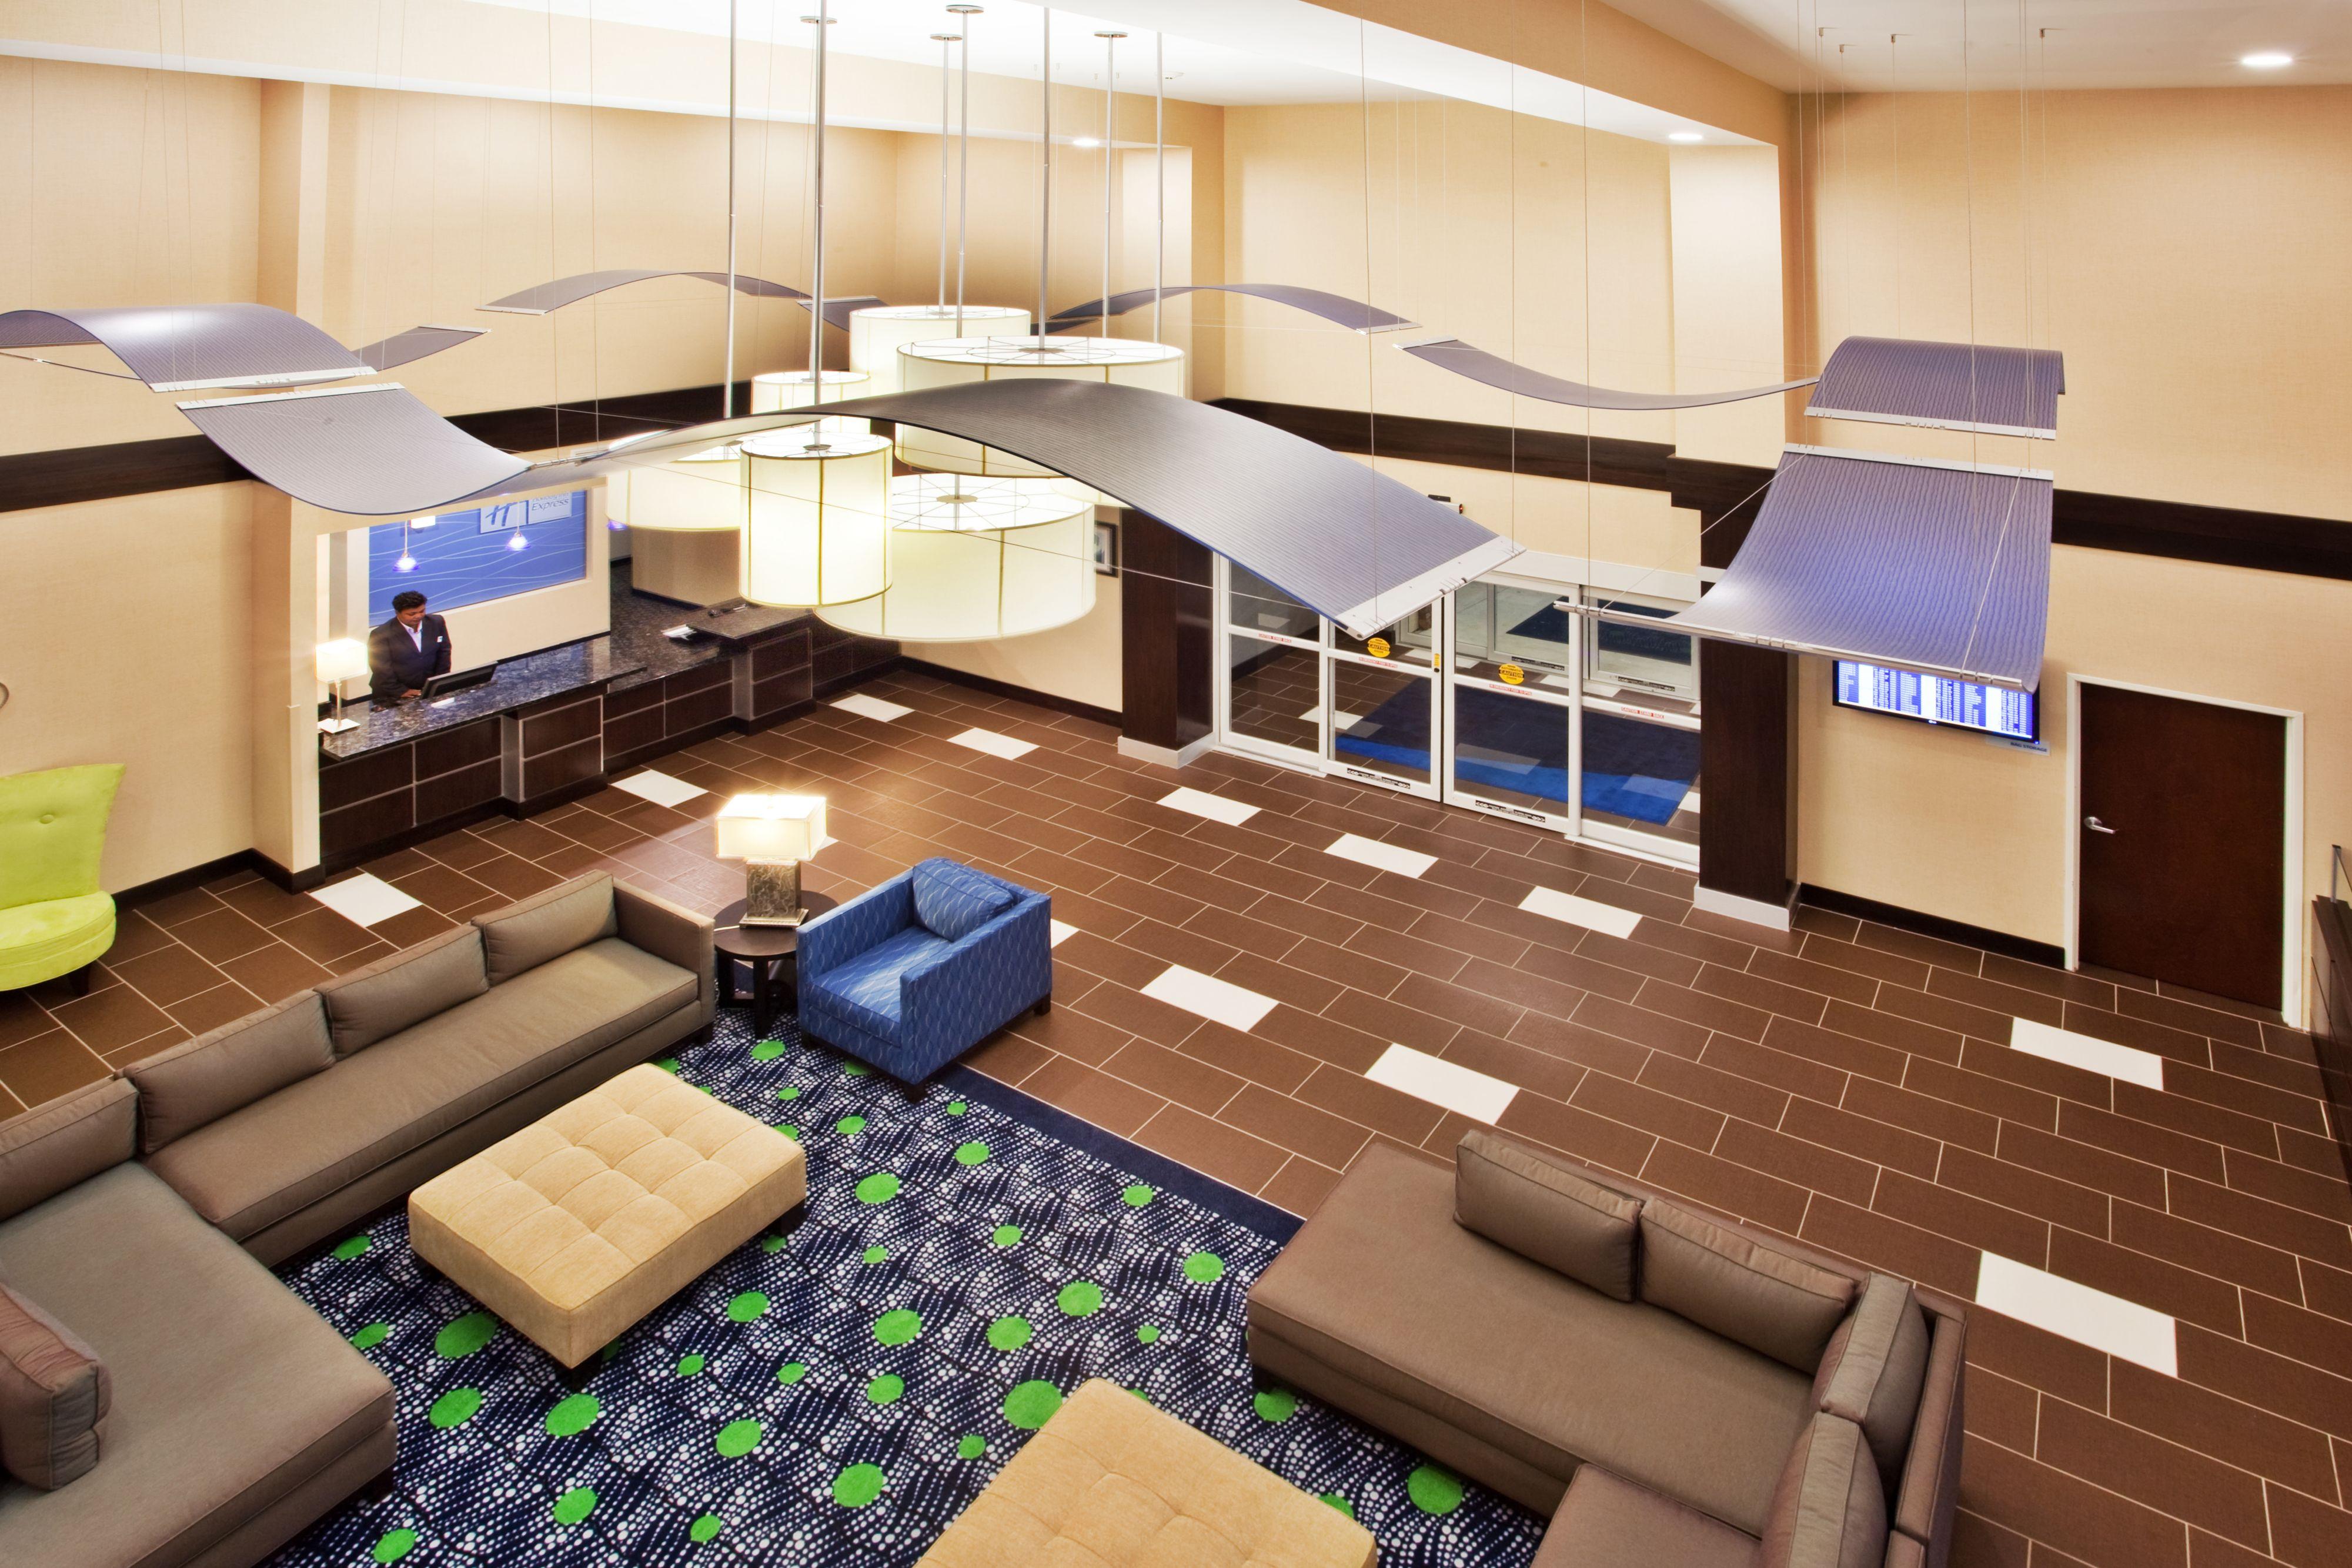 Holiday Inn Express & Suites Atlanta Arpt West - Camp Creek image 4